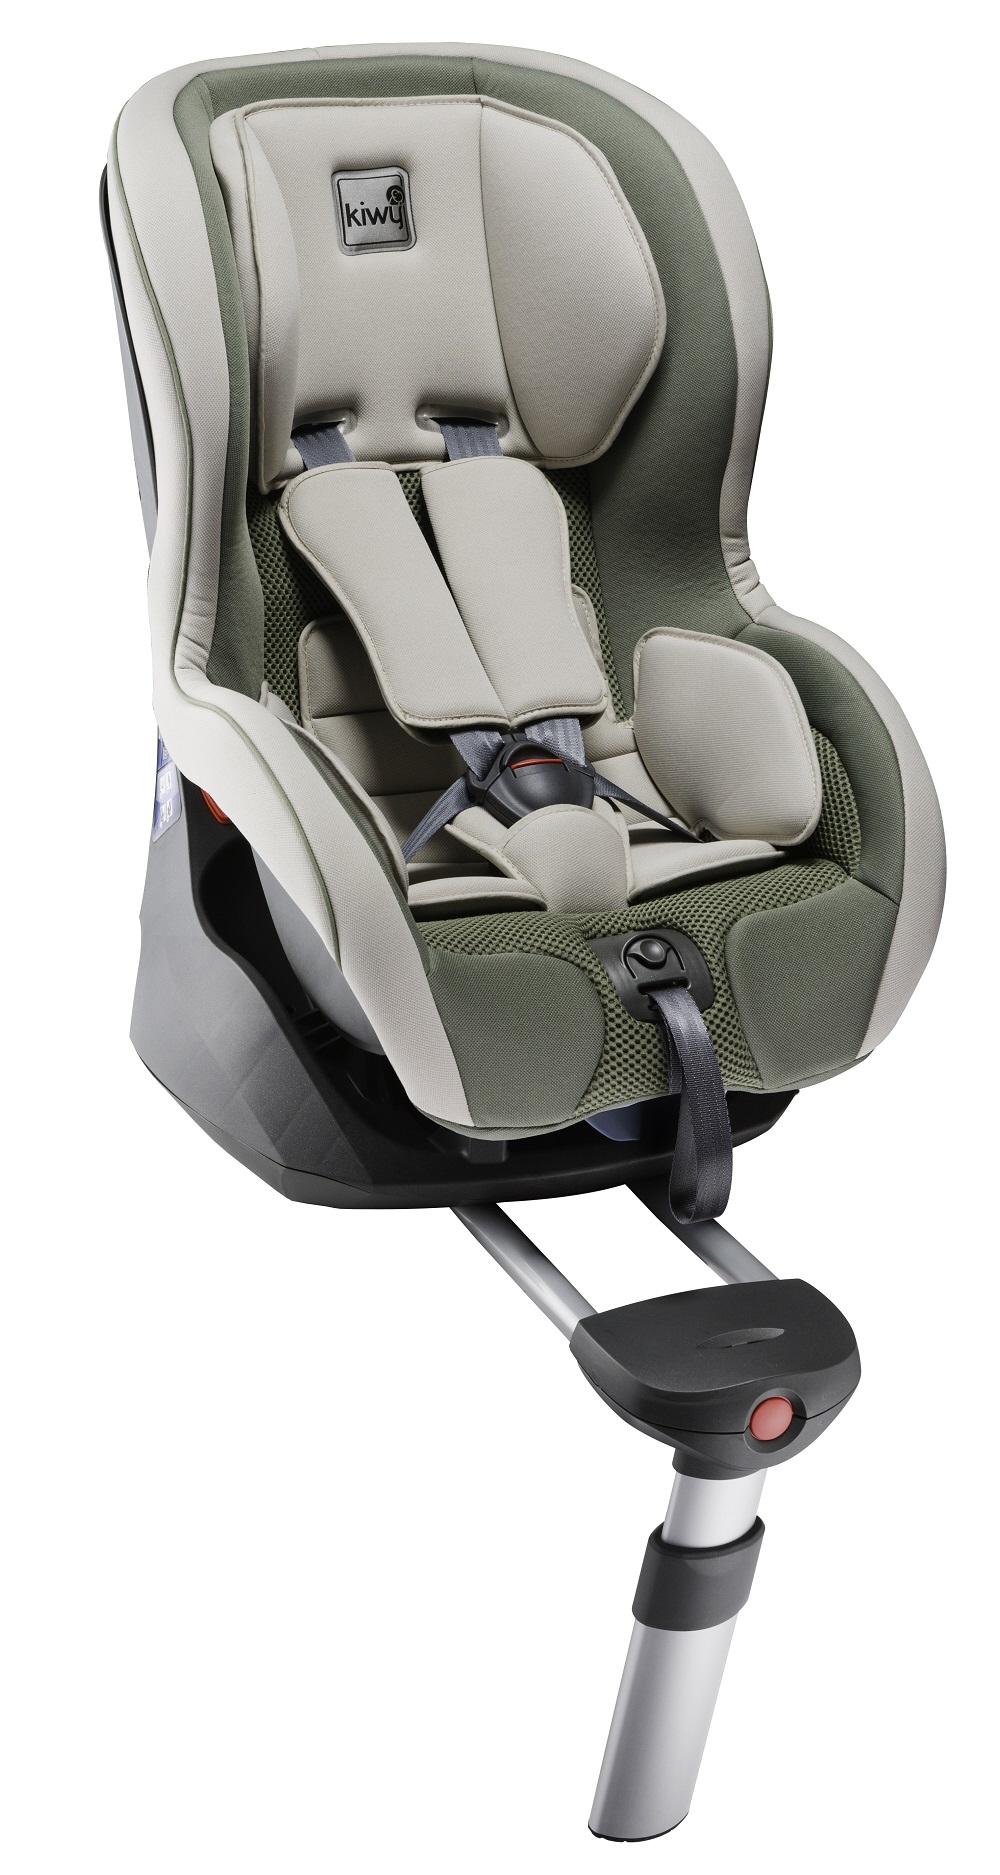 Kiwy SPF1 Isofix 兒童汽車安全座椅 2015 Aloe kidsroom德國直郵母嬰用品網店